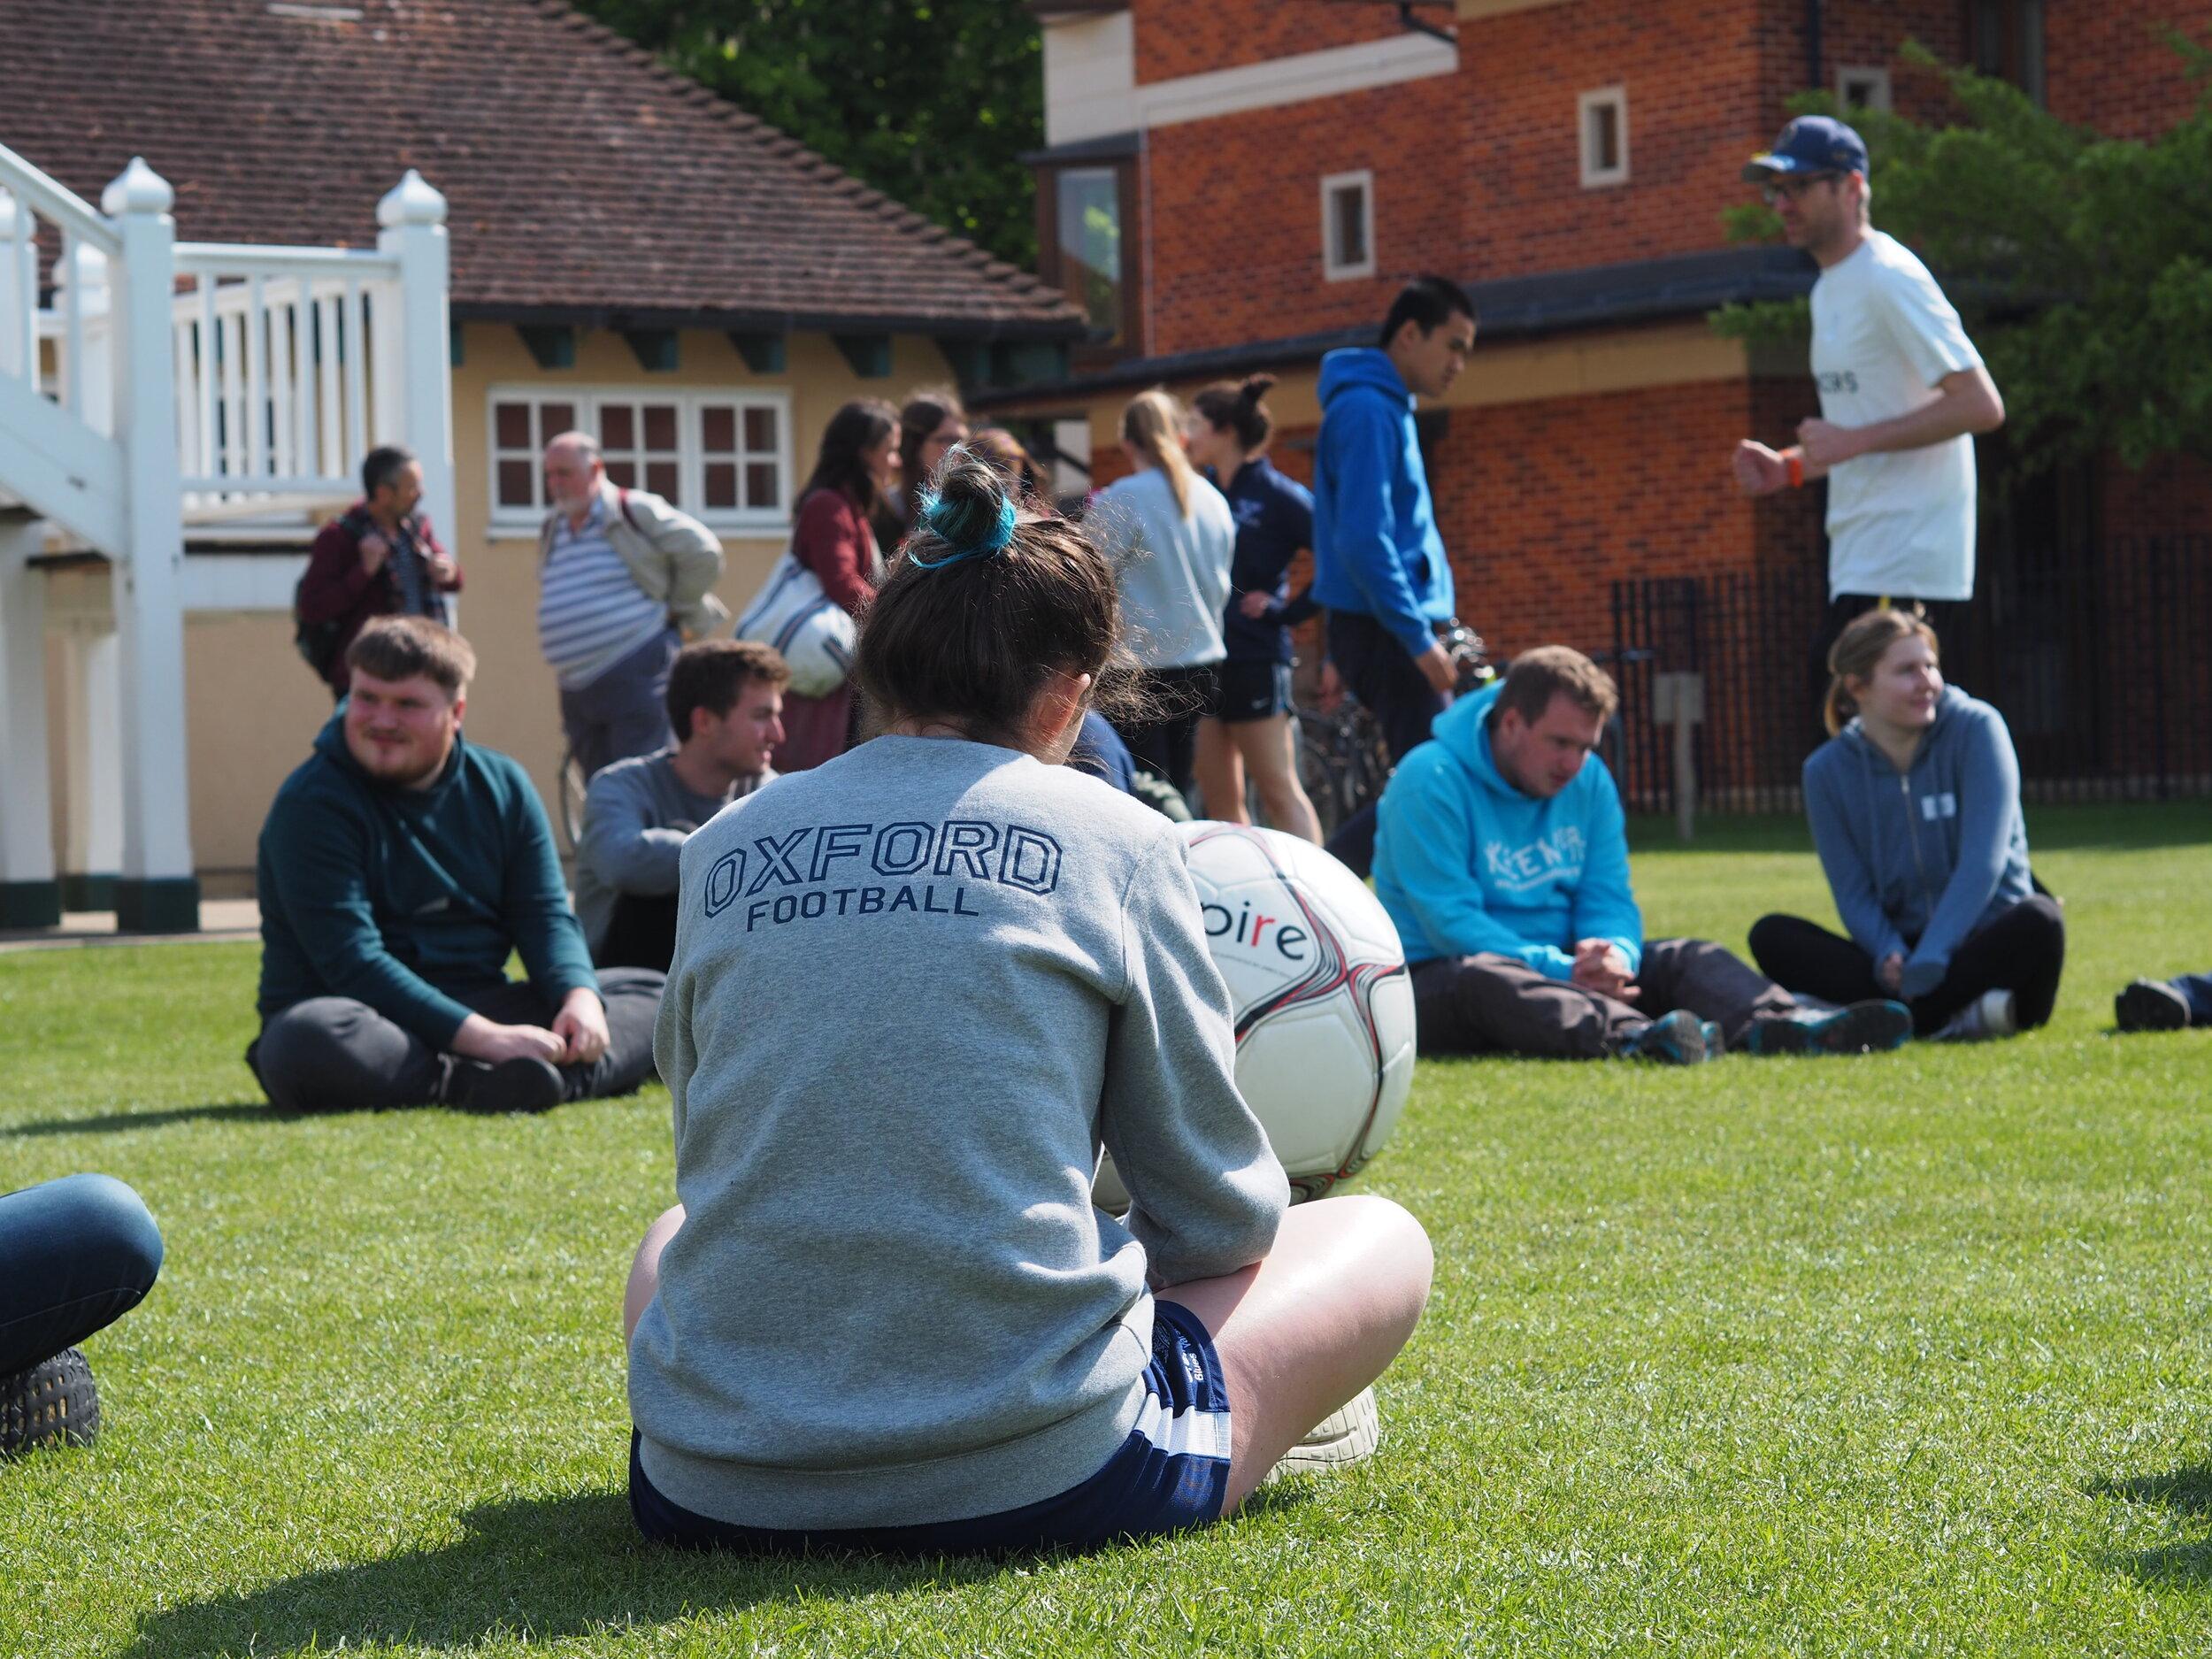 Oxford University Football